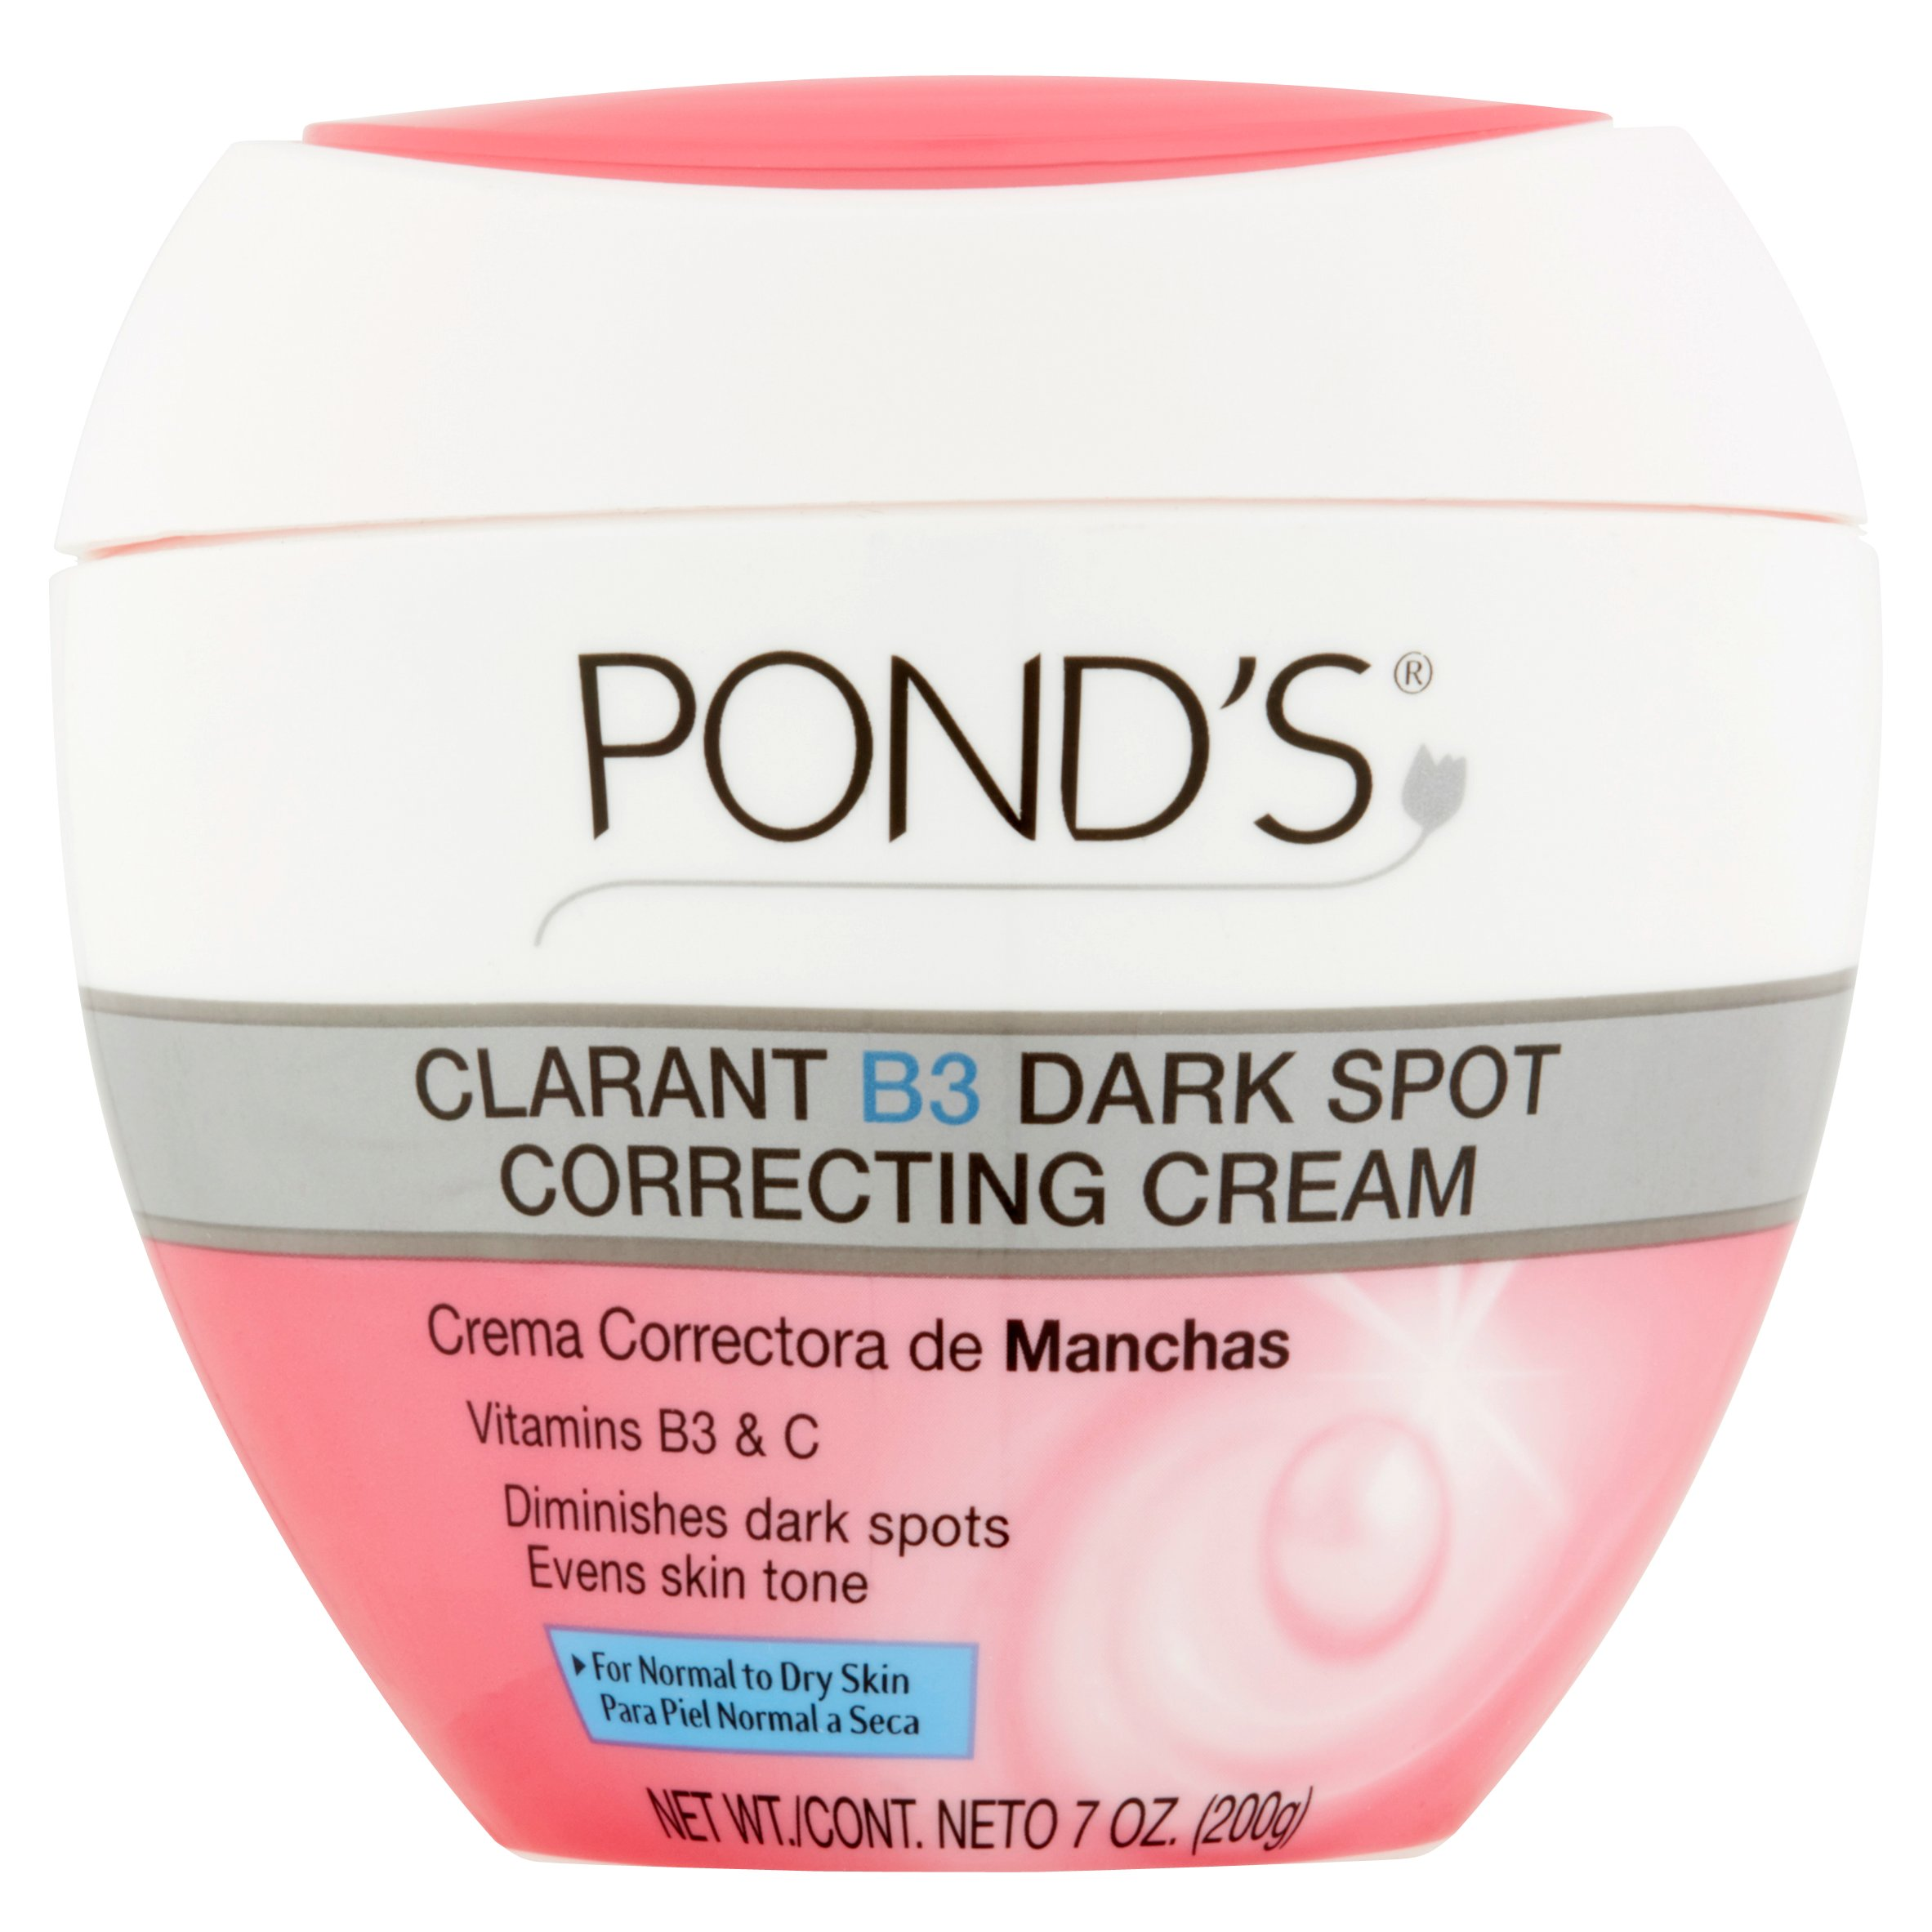 Pond's Correcting Cream Clarant B3 Dark Spot Normal to Dry Skin 7 oz